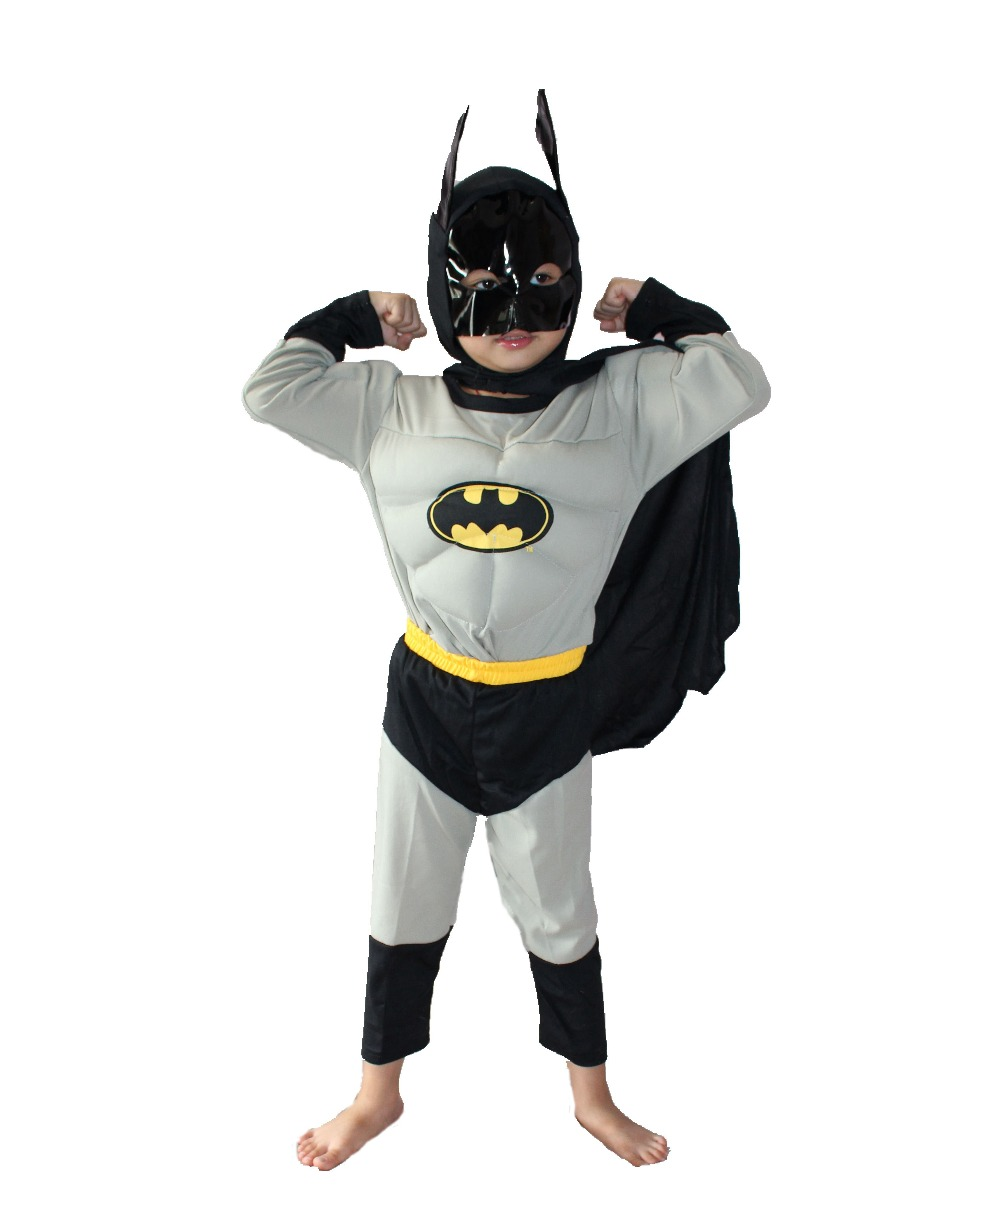 Gris 3-7 años Fiesta Niños Comic Marvel Batman Muscle Disfraz de Halloween, Boy roll play clothing Camiseta de manga larga